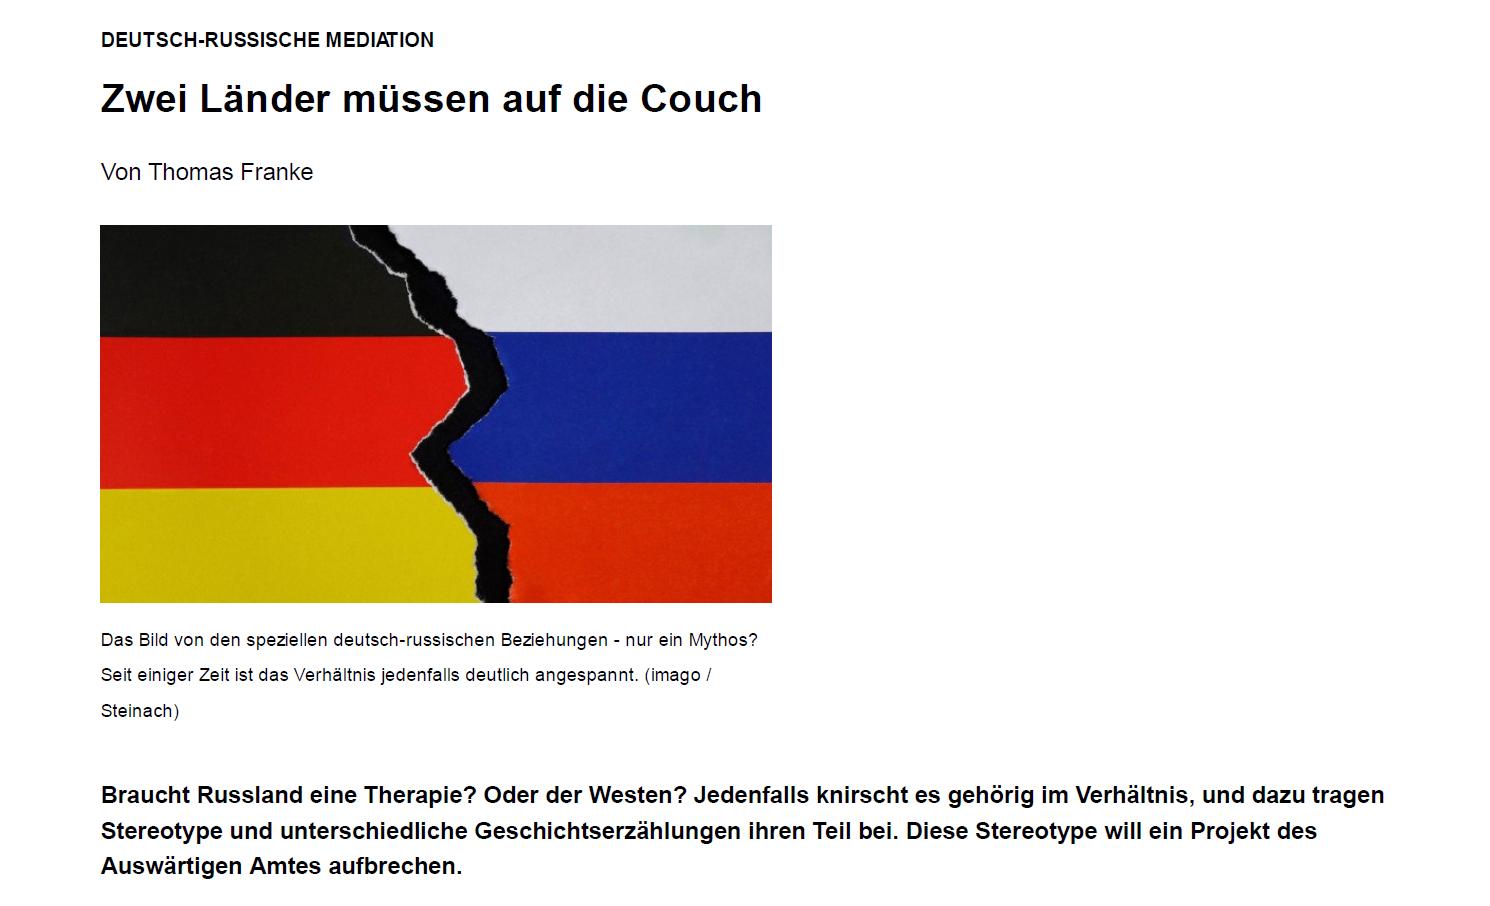 German-Russian Mediation